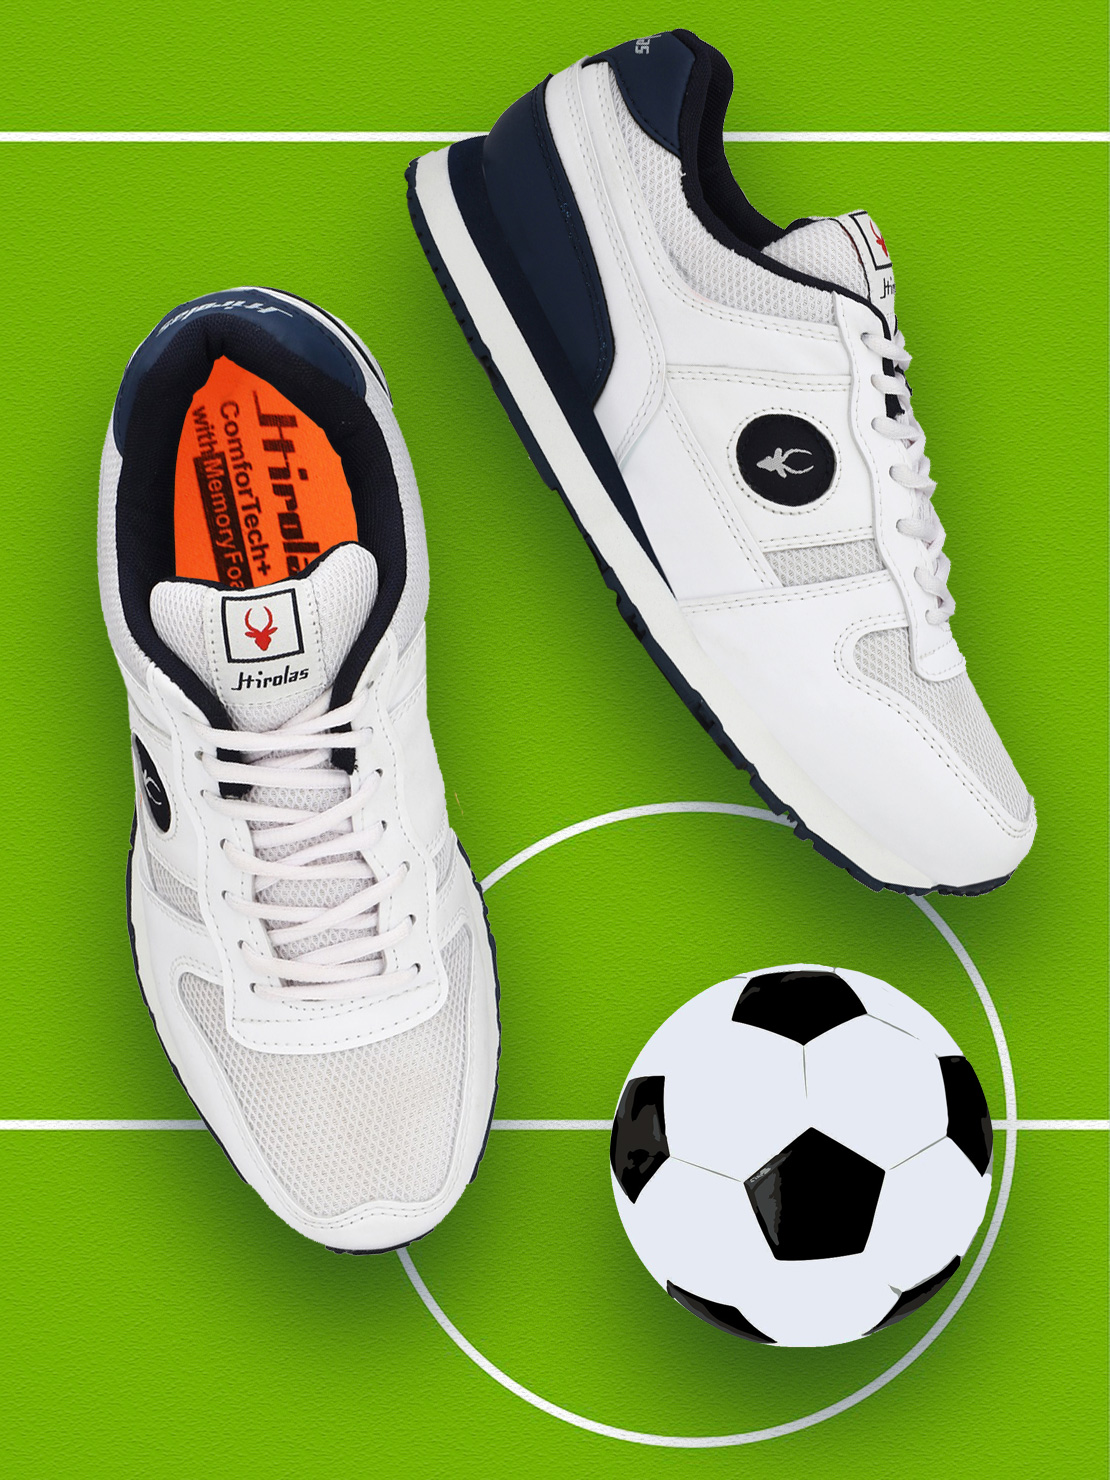 Hirolas | Hirolas Multi Sport Shock Absorbing Walking  Running Fitness Athletic Training Gym Fashion Sneaker Shoes - White/Blue